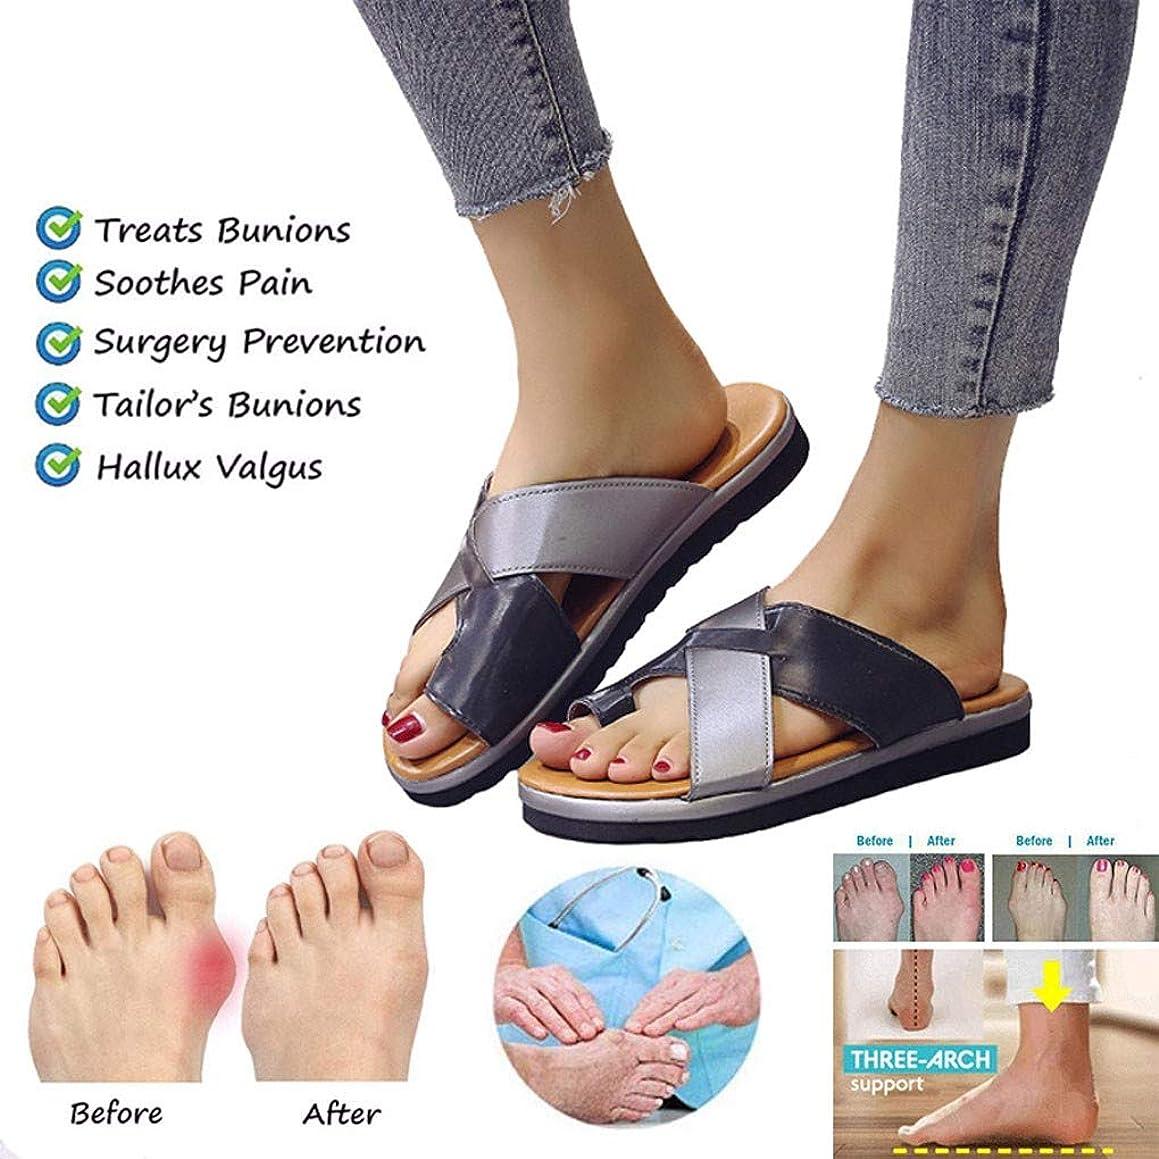 JPNVXIE Sandals for Women Bunion Correction, Arch and Bunion Support Sandals Women, Sandals for Women Gladiator, Summer Beach Travel Shoes